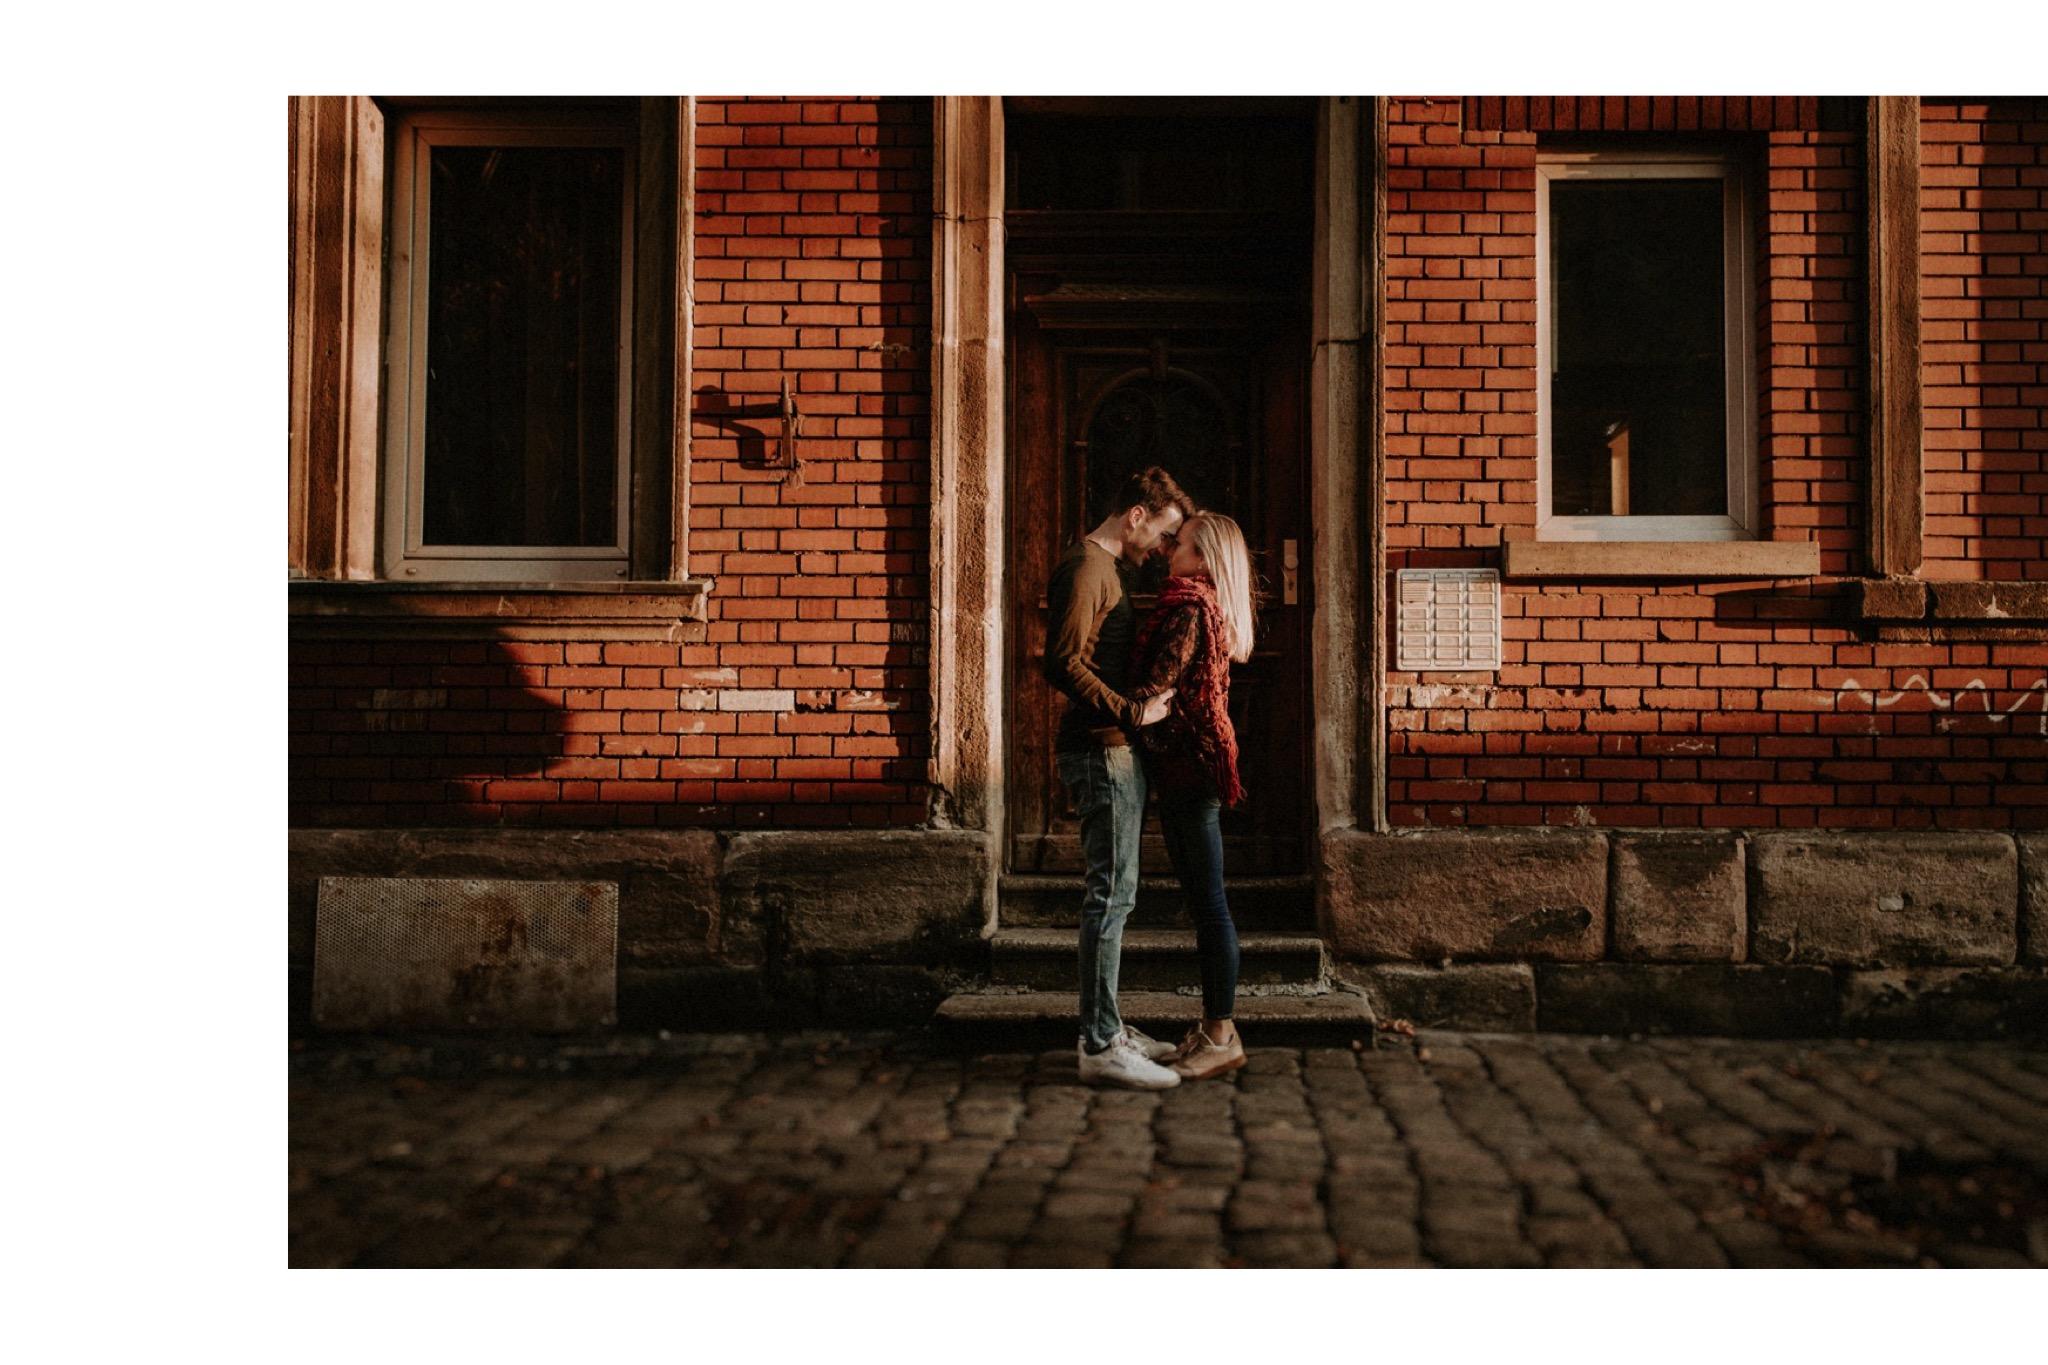 15_Carina & Fabian - Paarshooting-25_hochzeit_paarshooting_hochzeitsfotograf_nürnberg_intimatecouple.jpg